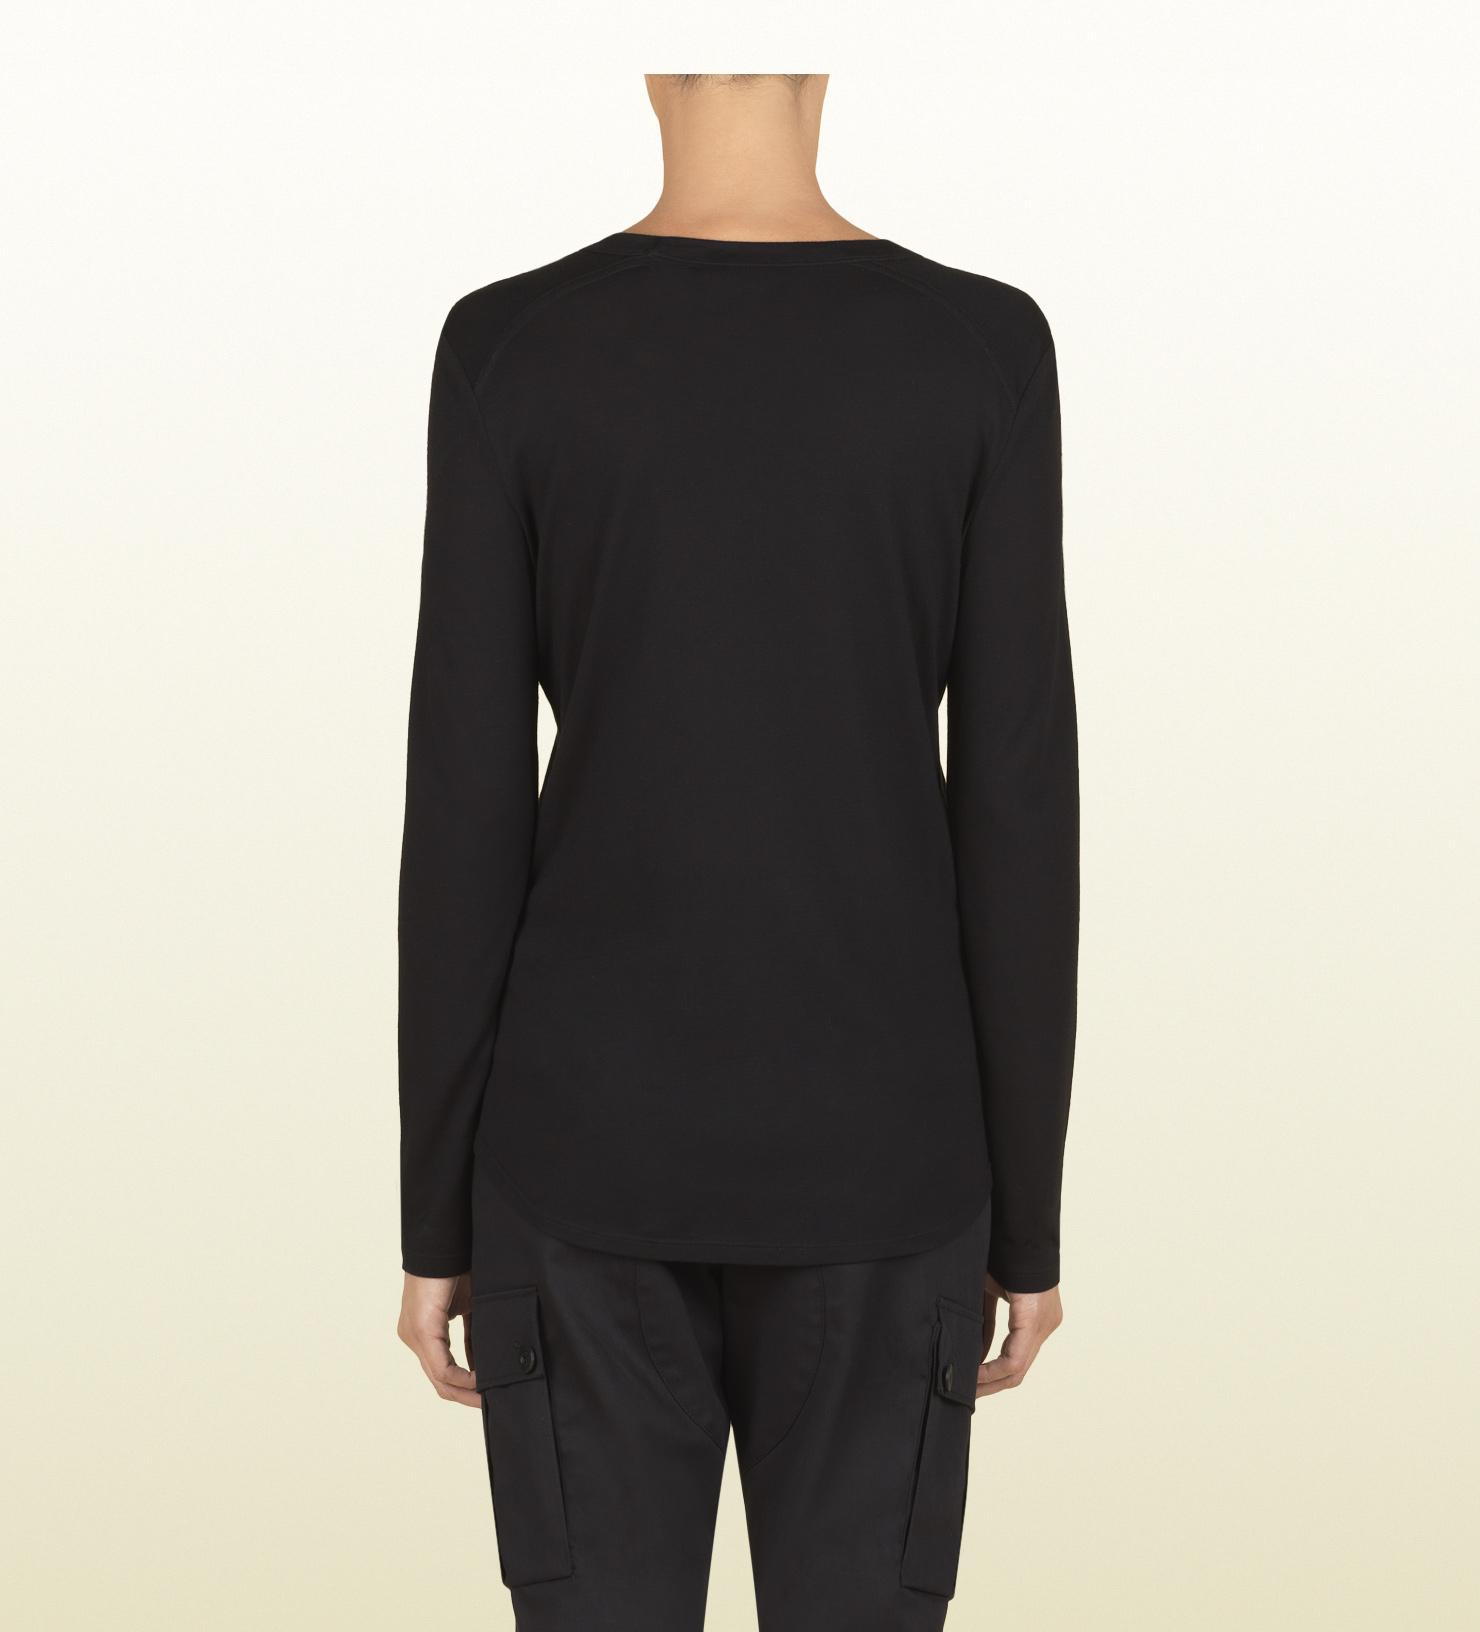 9f90d02d0 Gucci Women's Black Silk Jersey Long Sleeve T-shirt From Viaggio ...